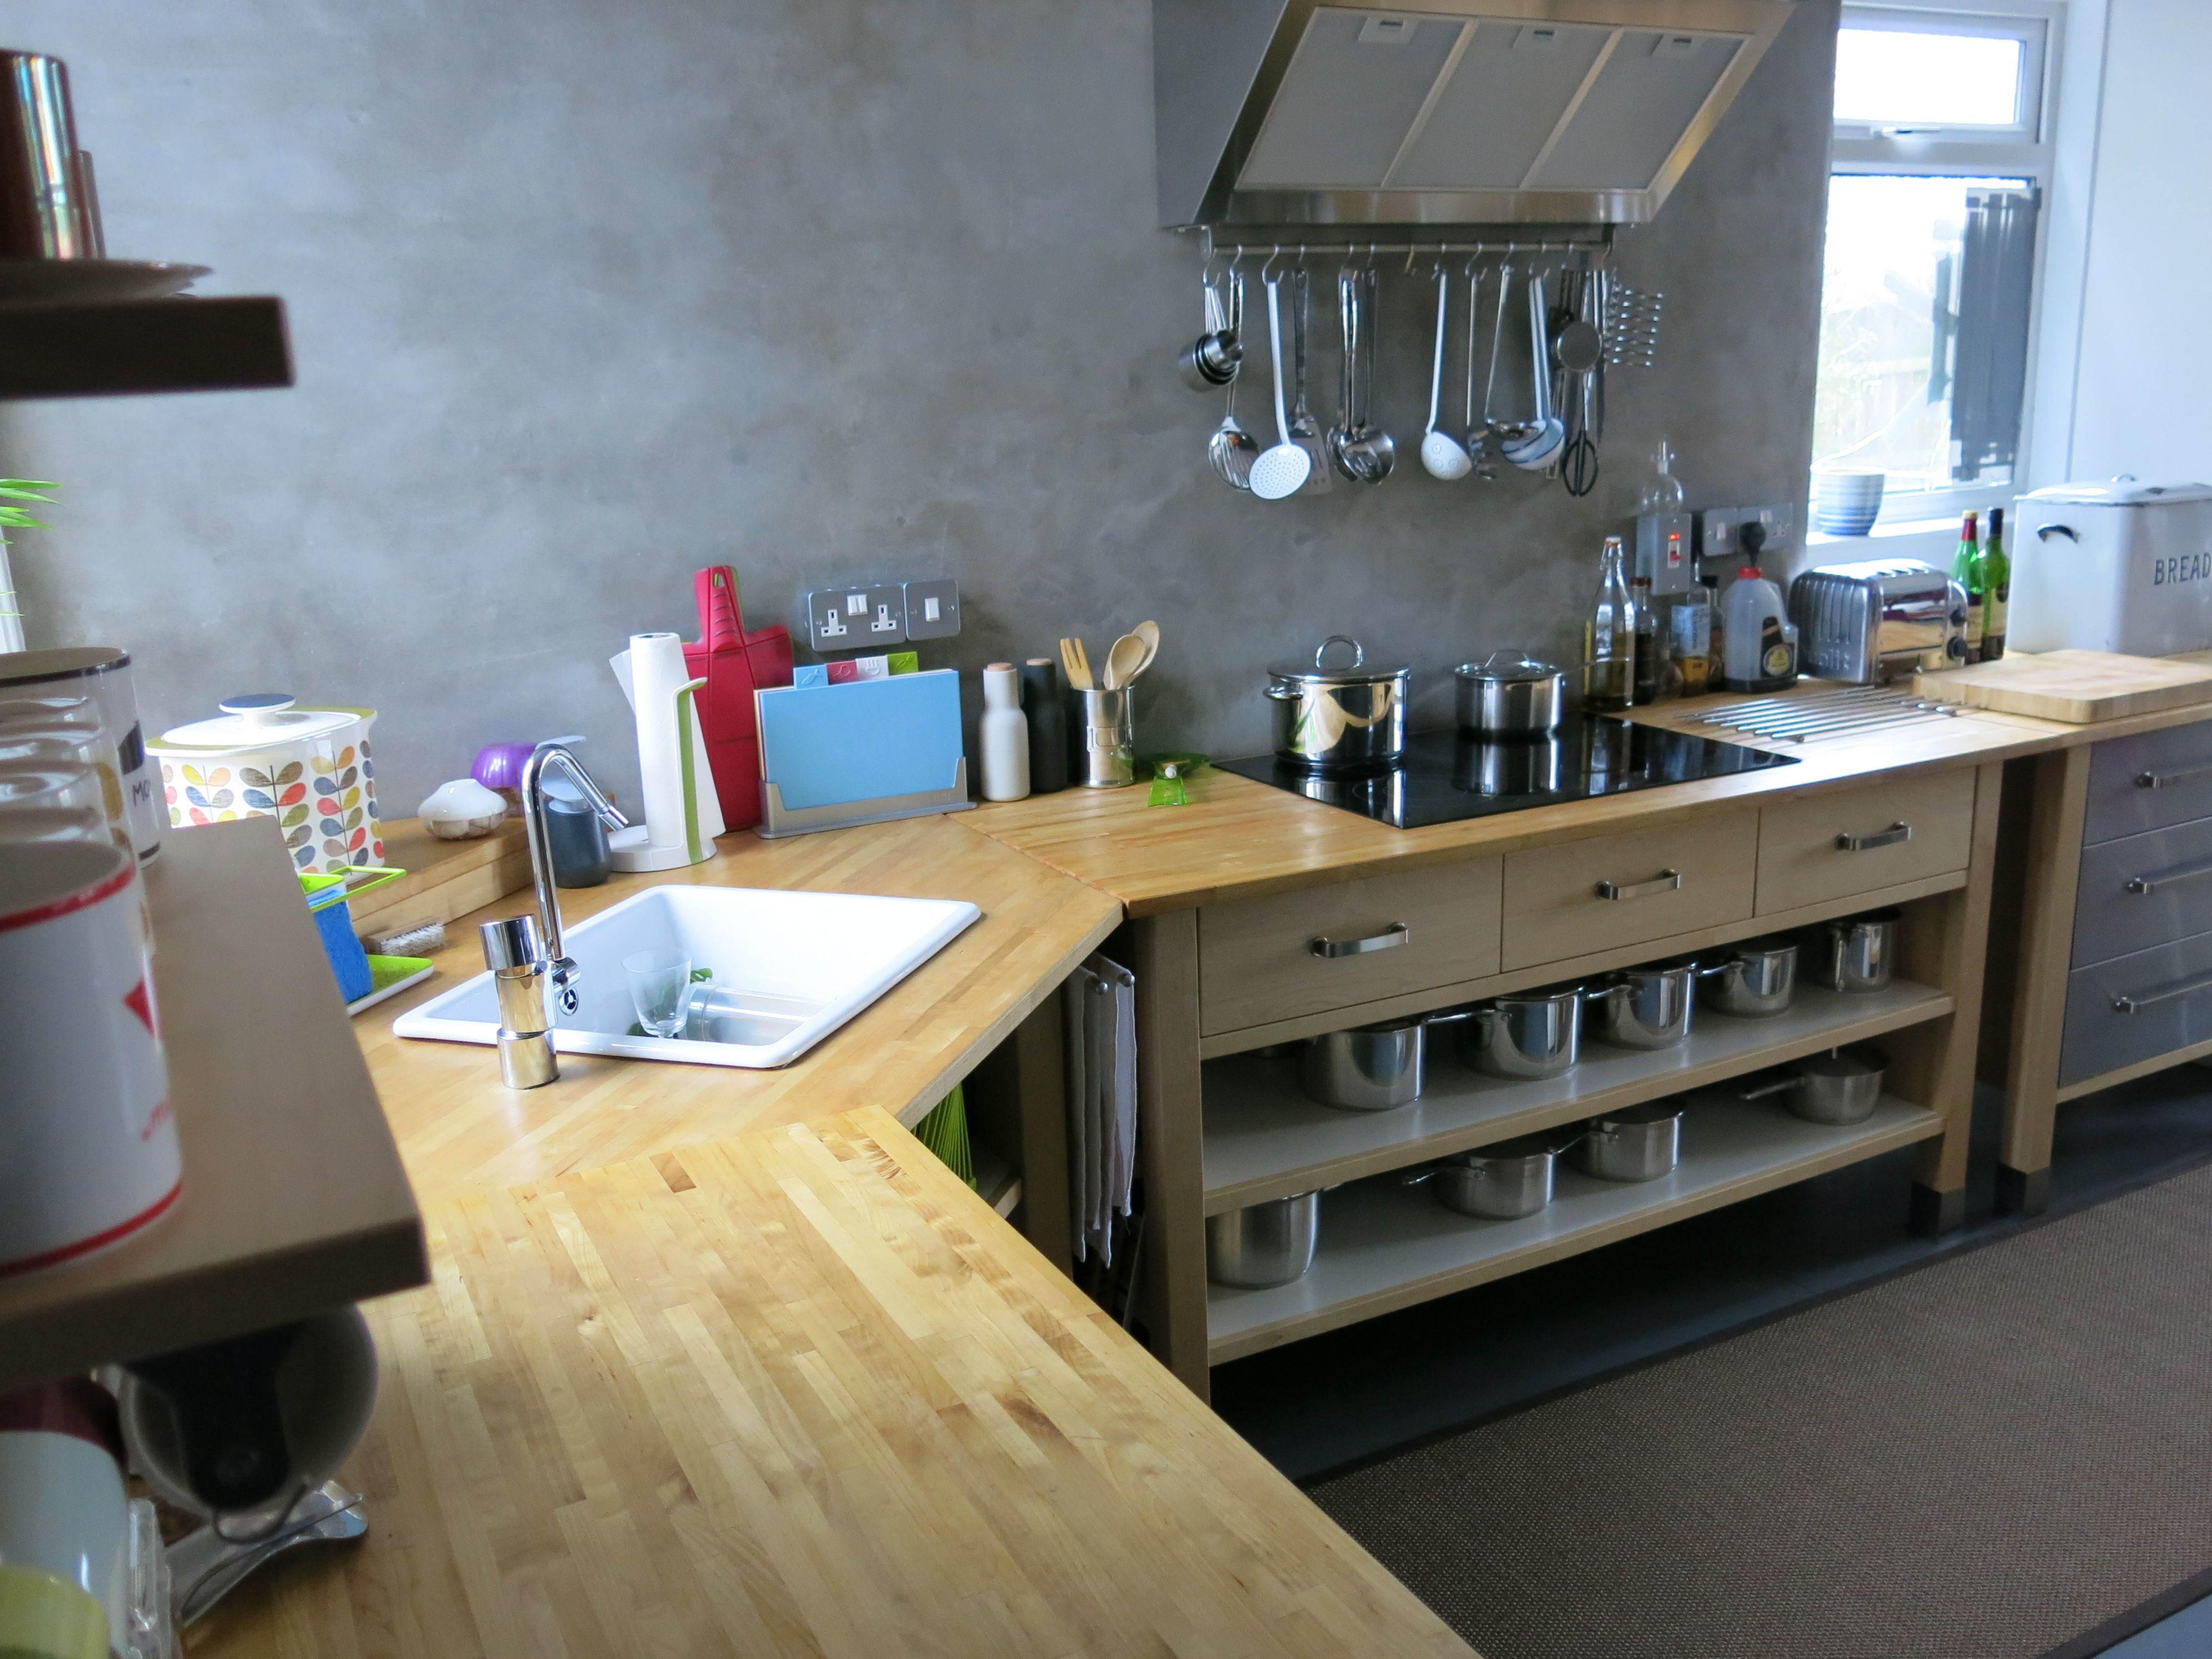 Vier cuisine ikea awesome cute module de cuisine la for Module de cuisine ikea